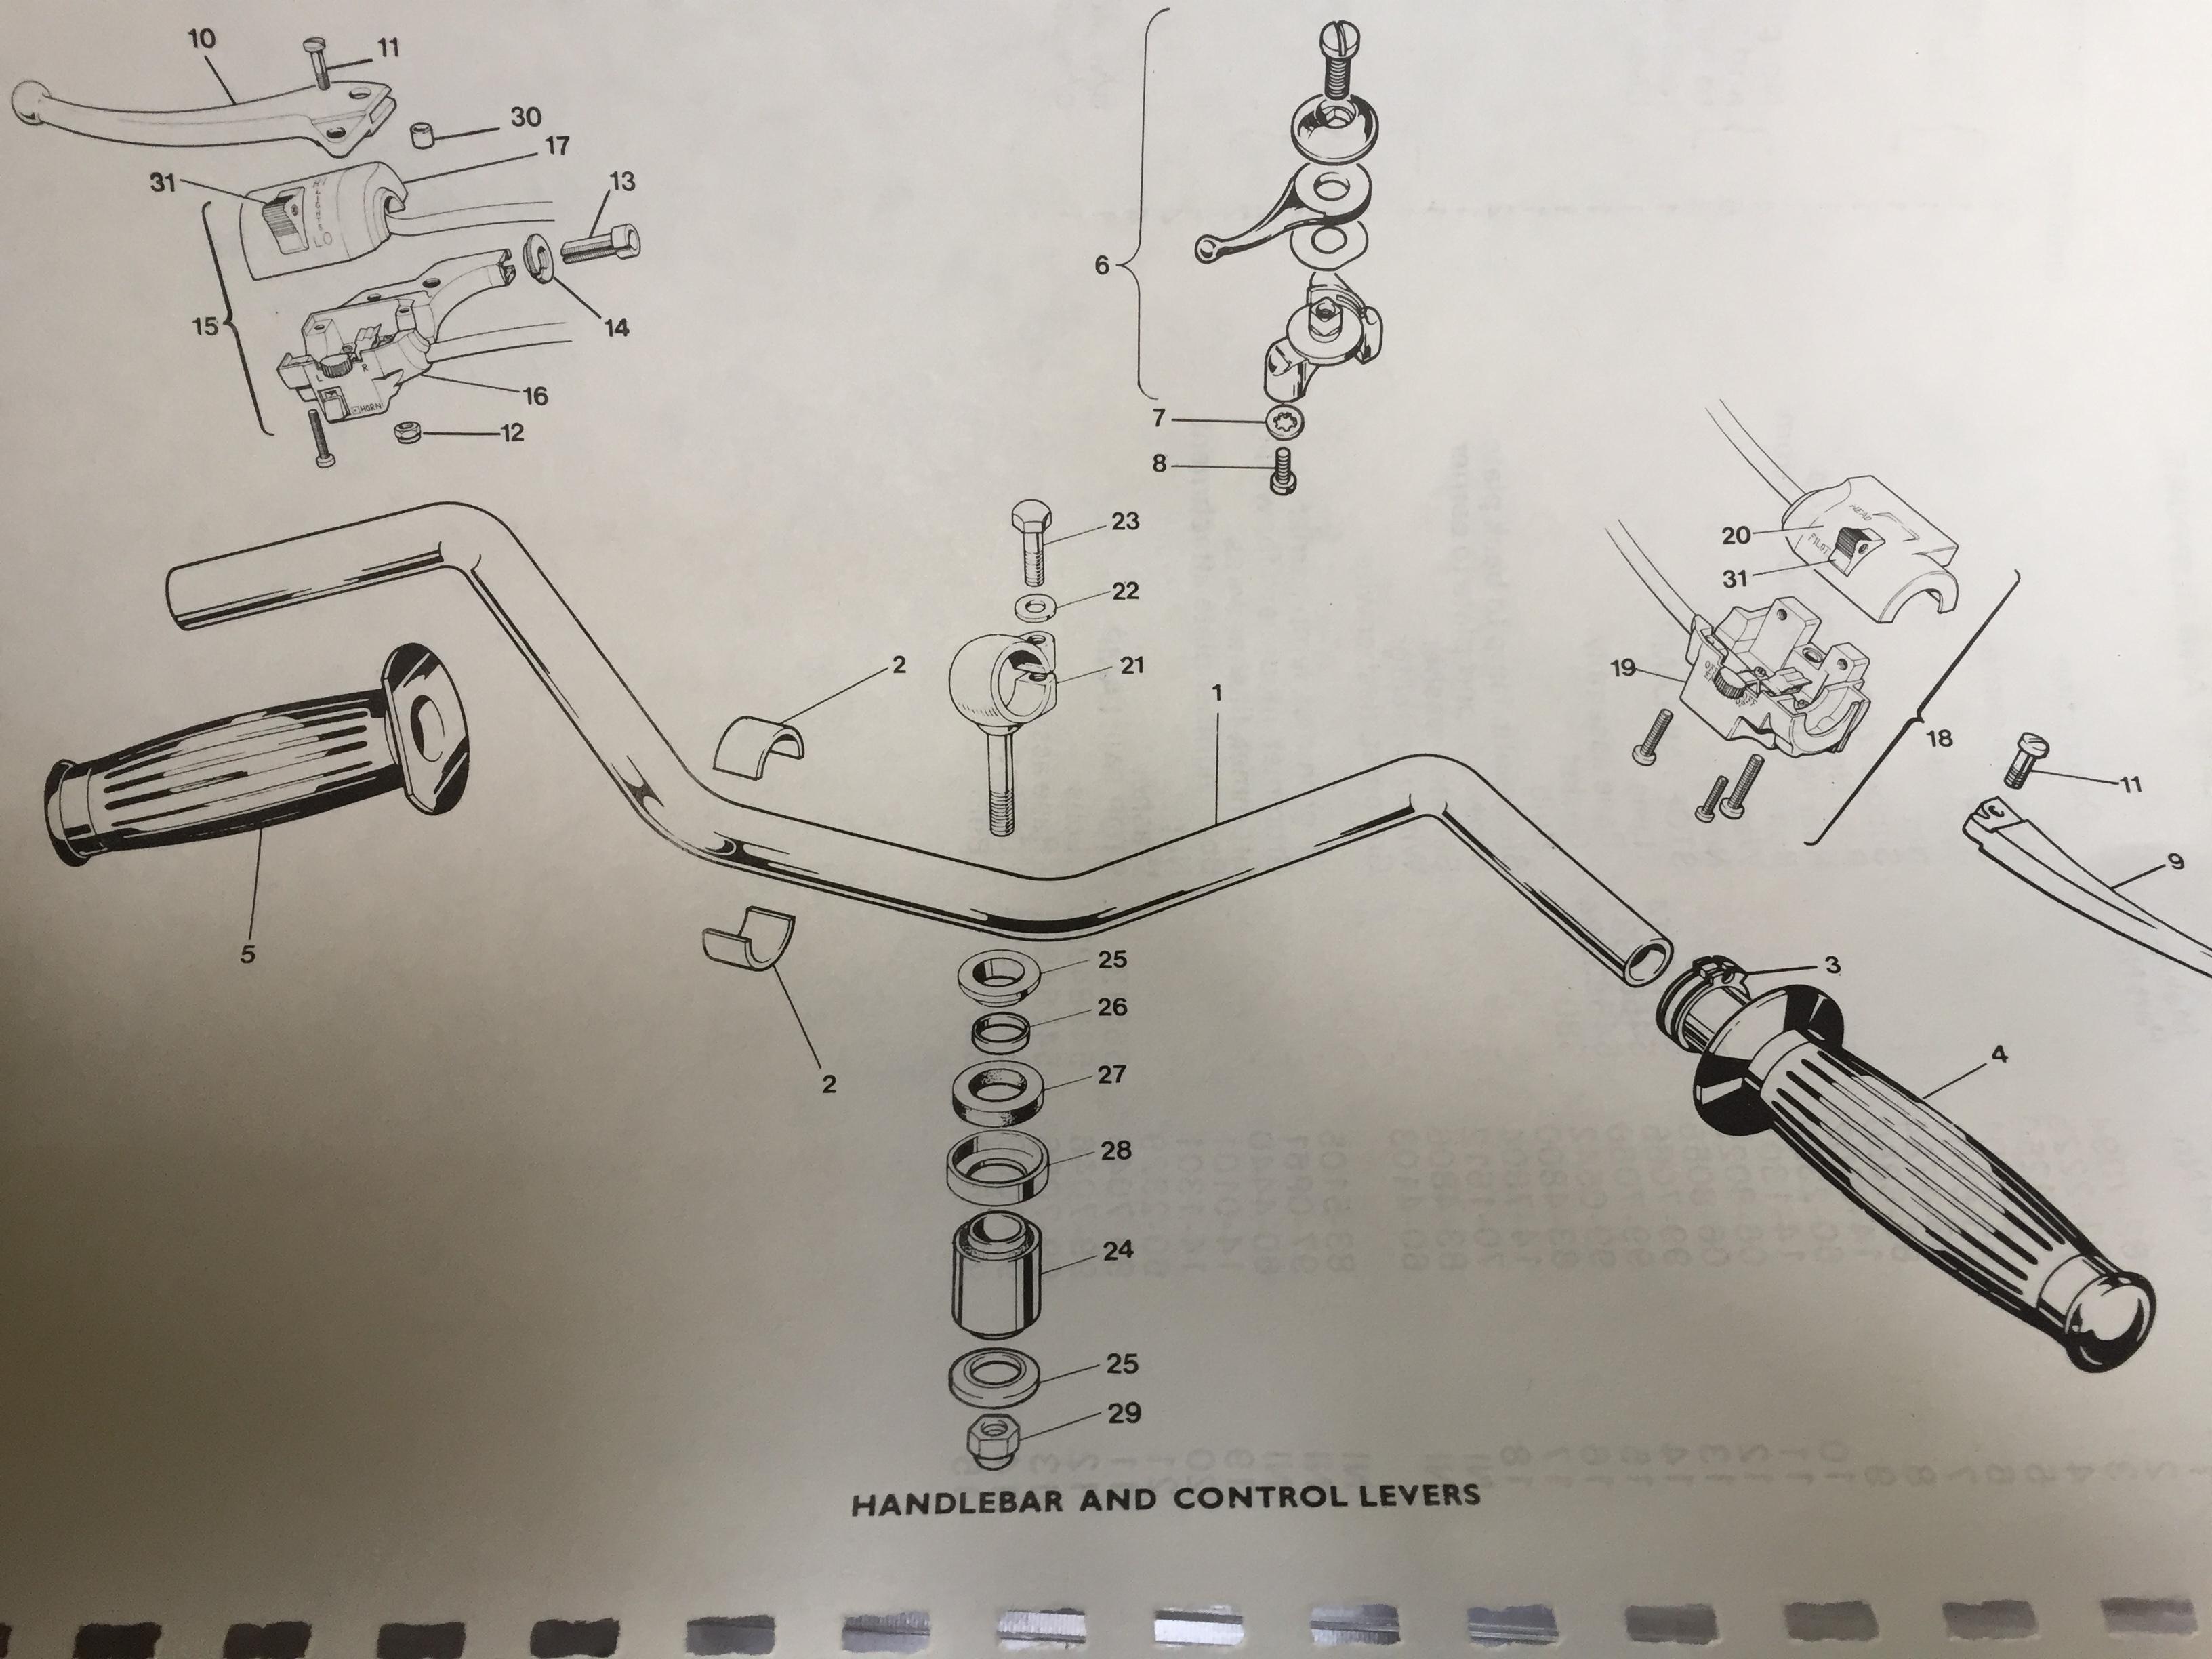 1976 Triumph T140v Wiring Diagram